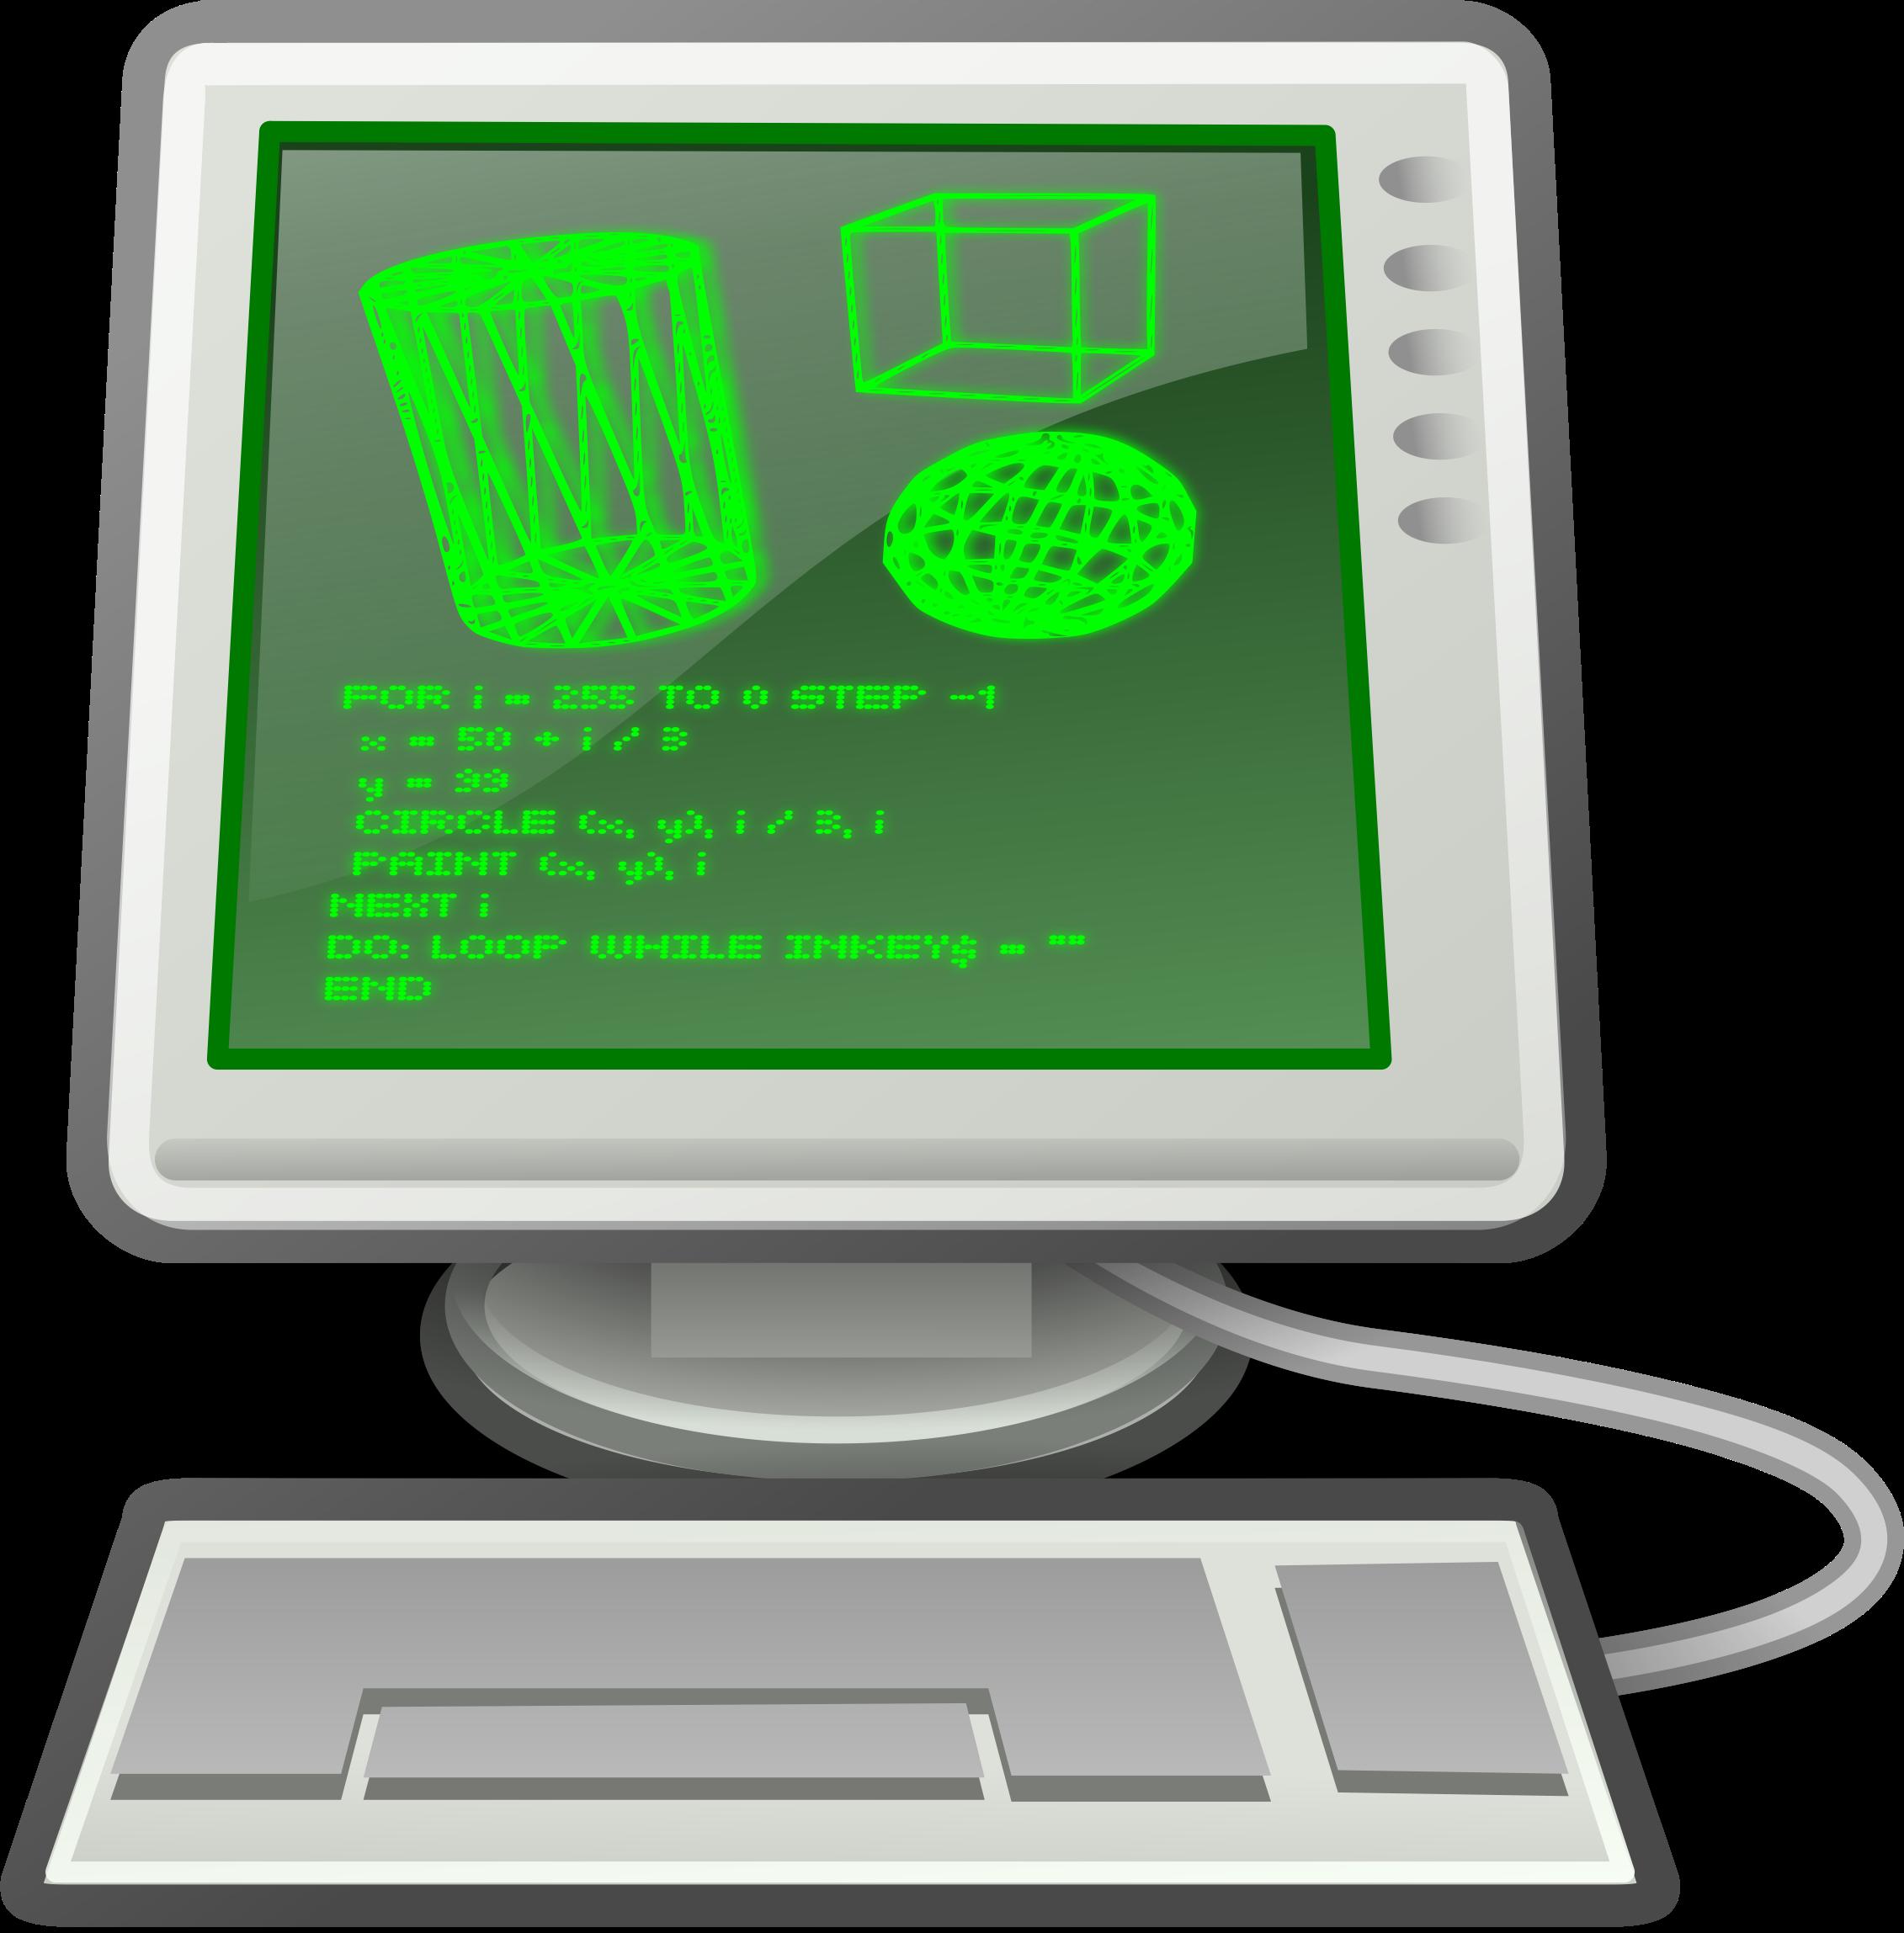 Circle clipart computer. Retro big image png